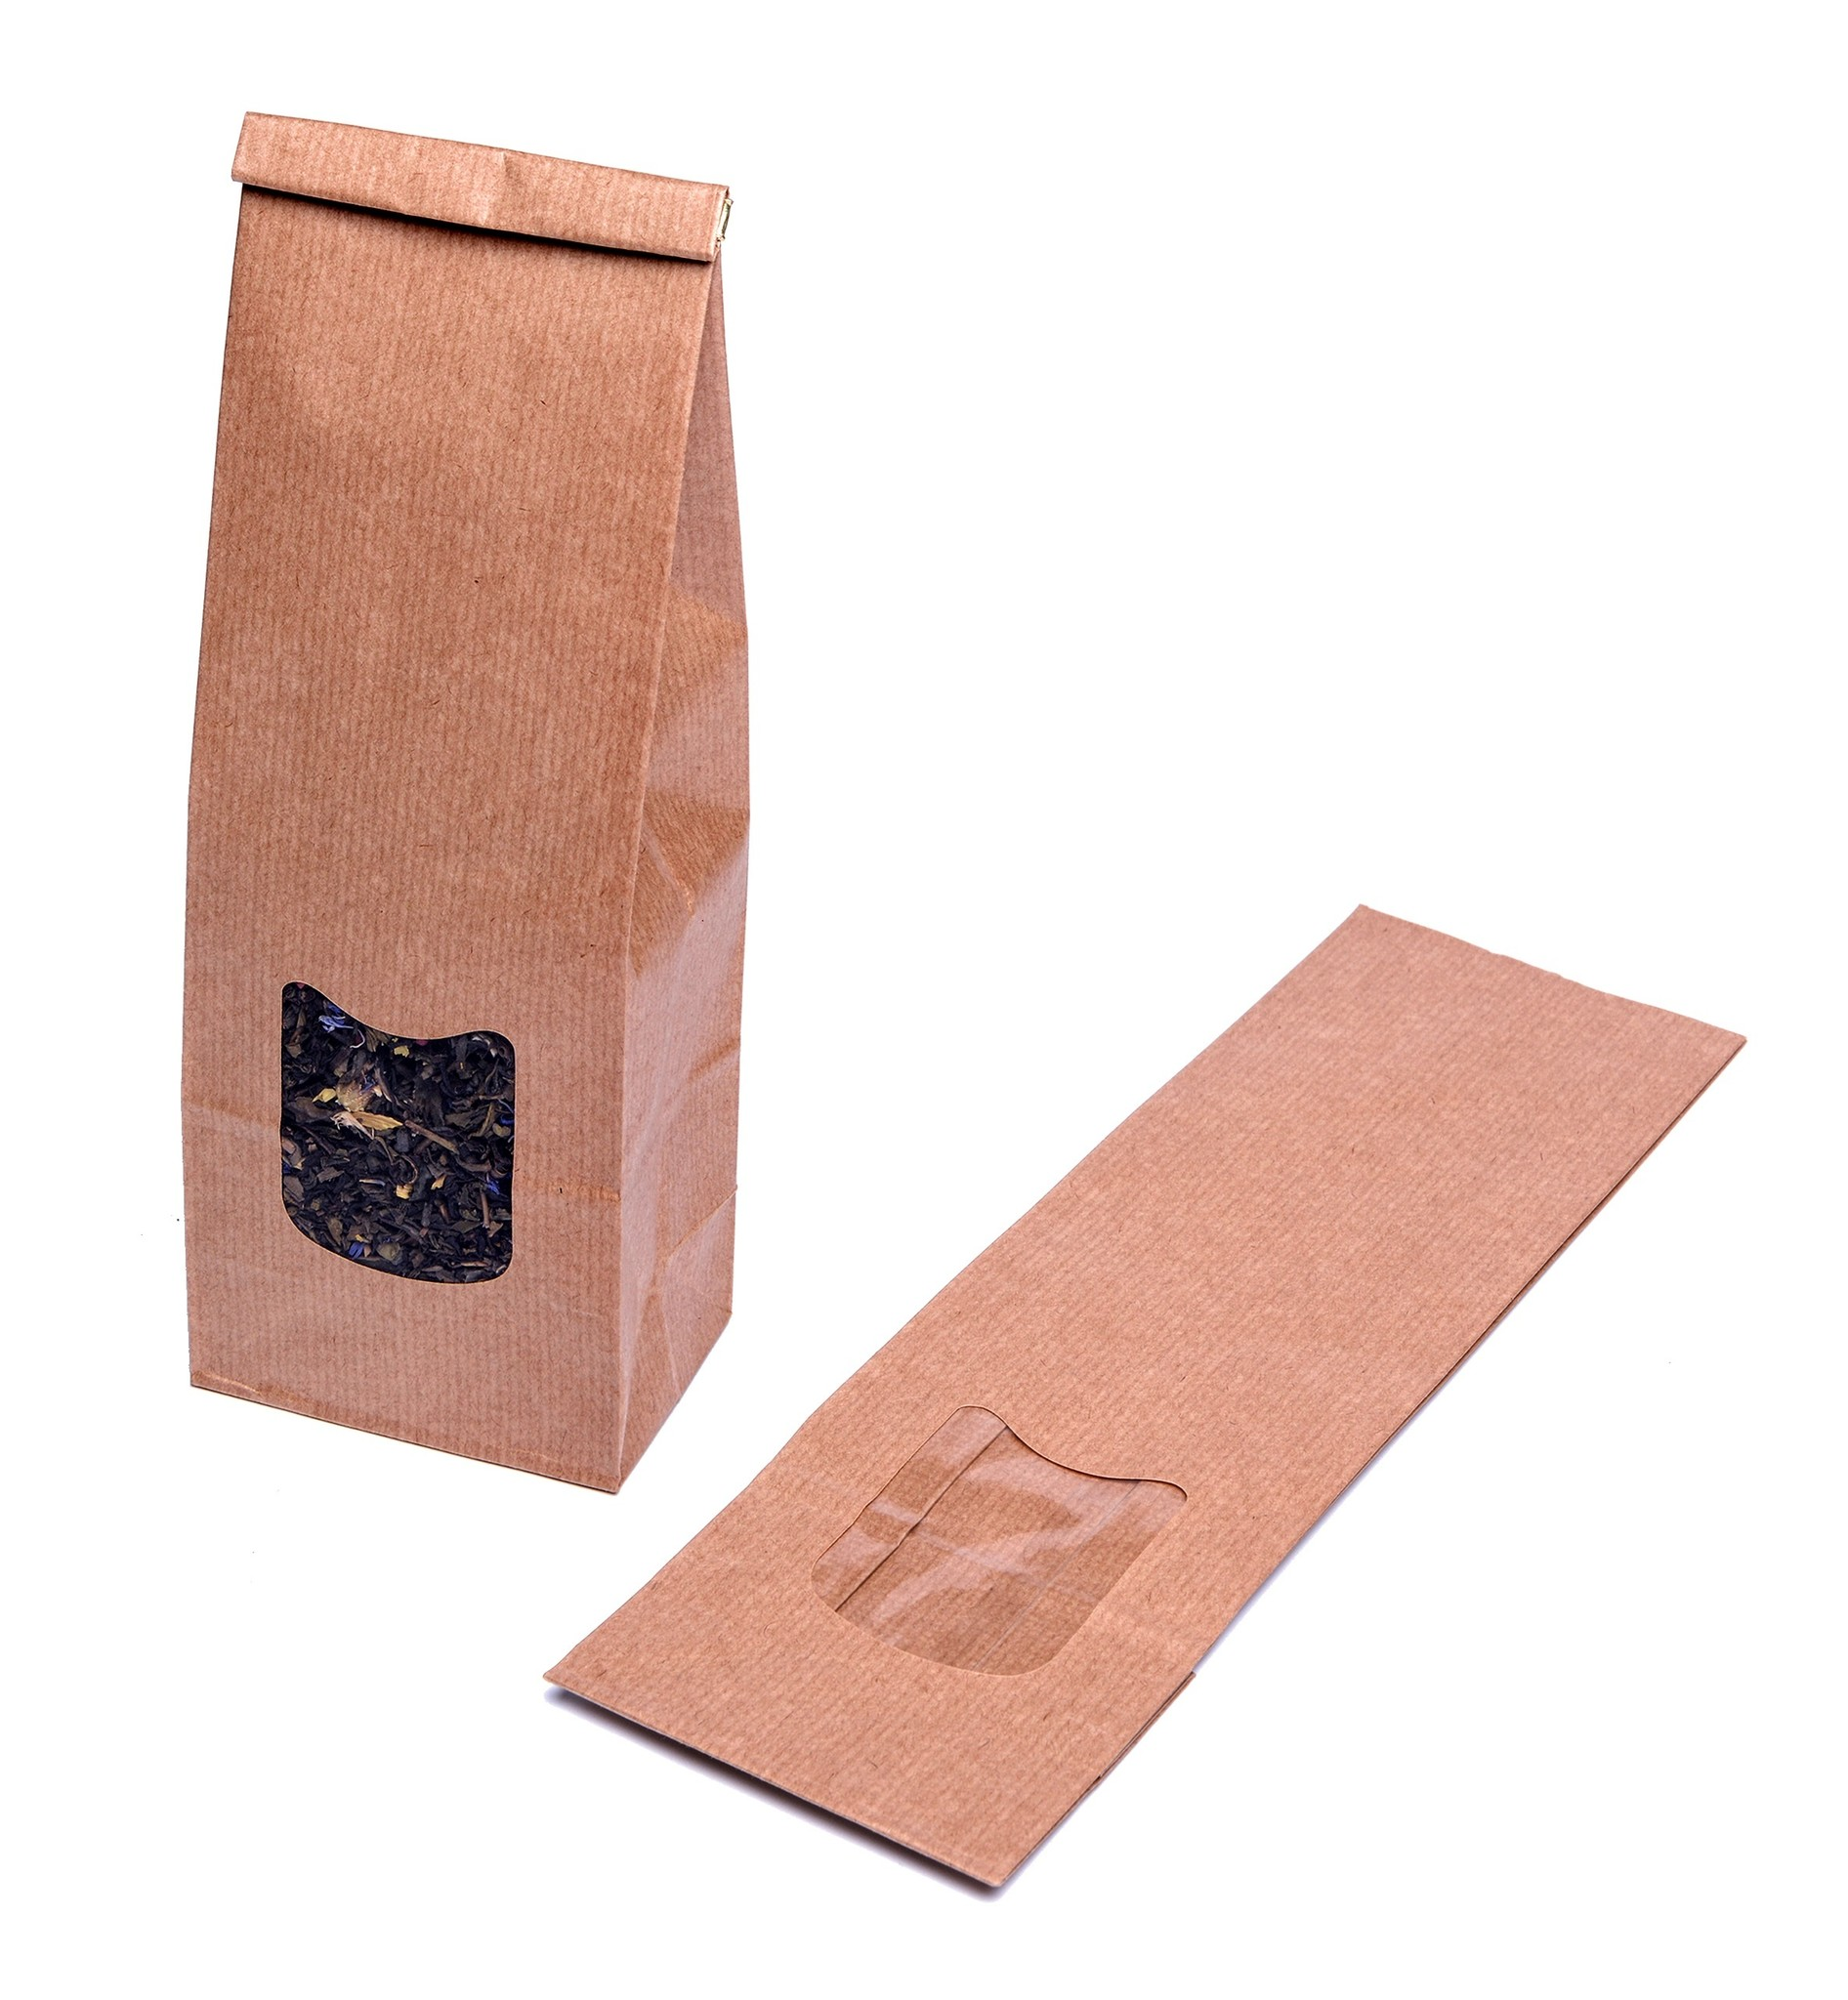 Blokbodemzakjes met venster 105 + 65 x 300 mm uit 80 grams bruin kraft pakje van 100 stuks